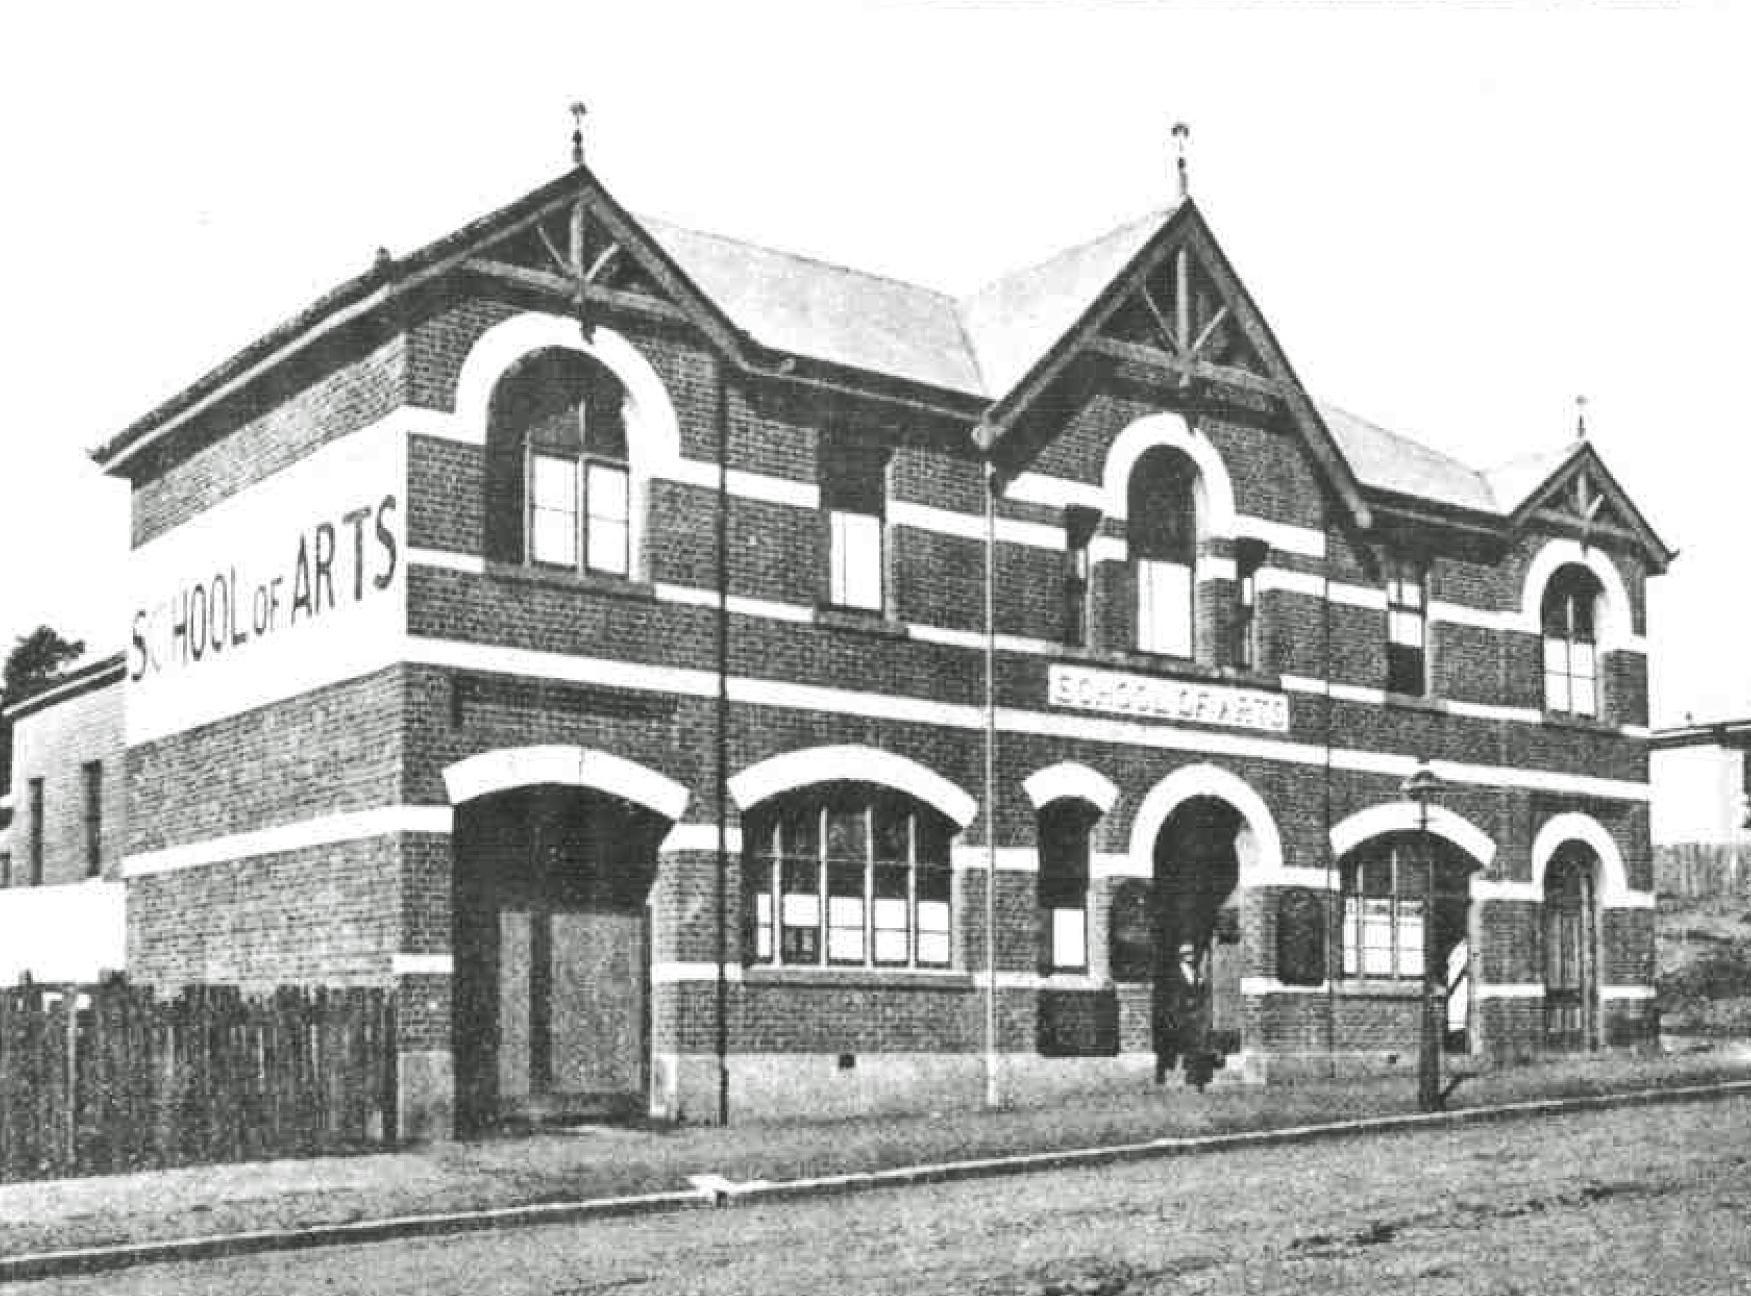 west end school arts sydney daily mail sep 10 1898